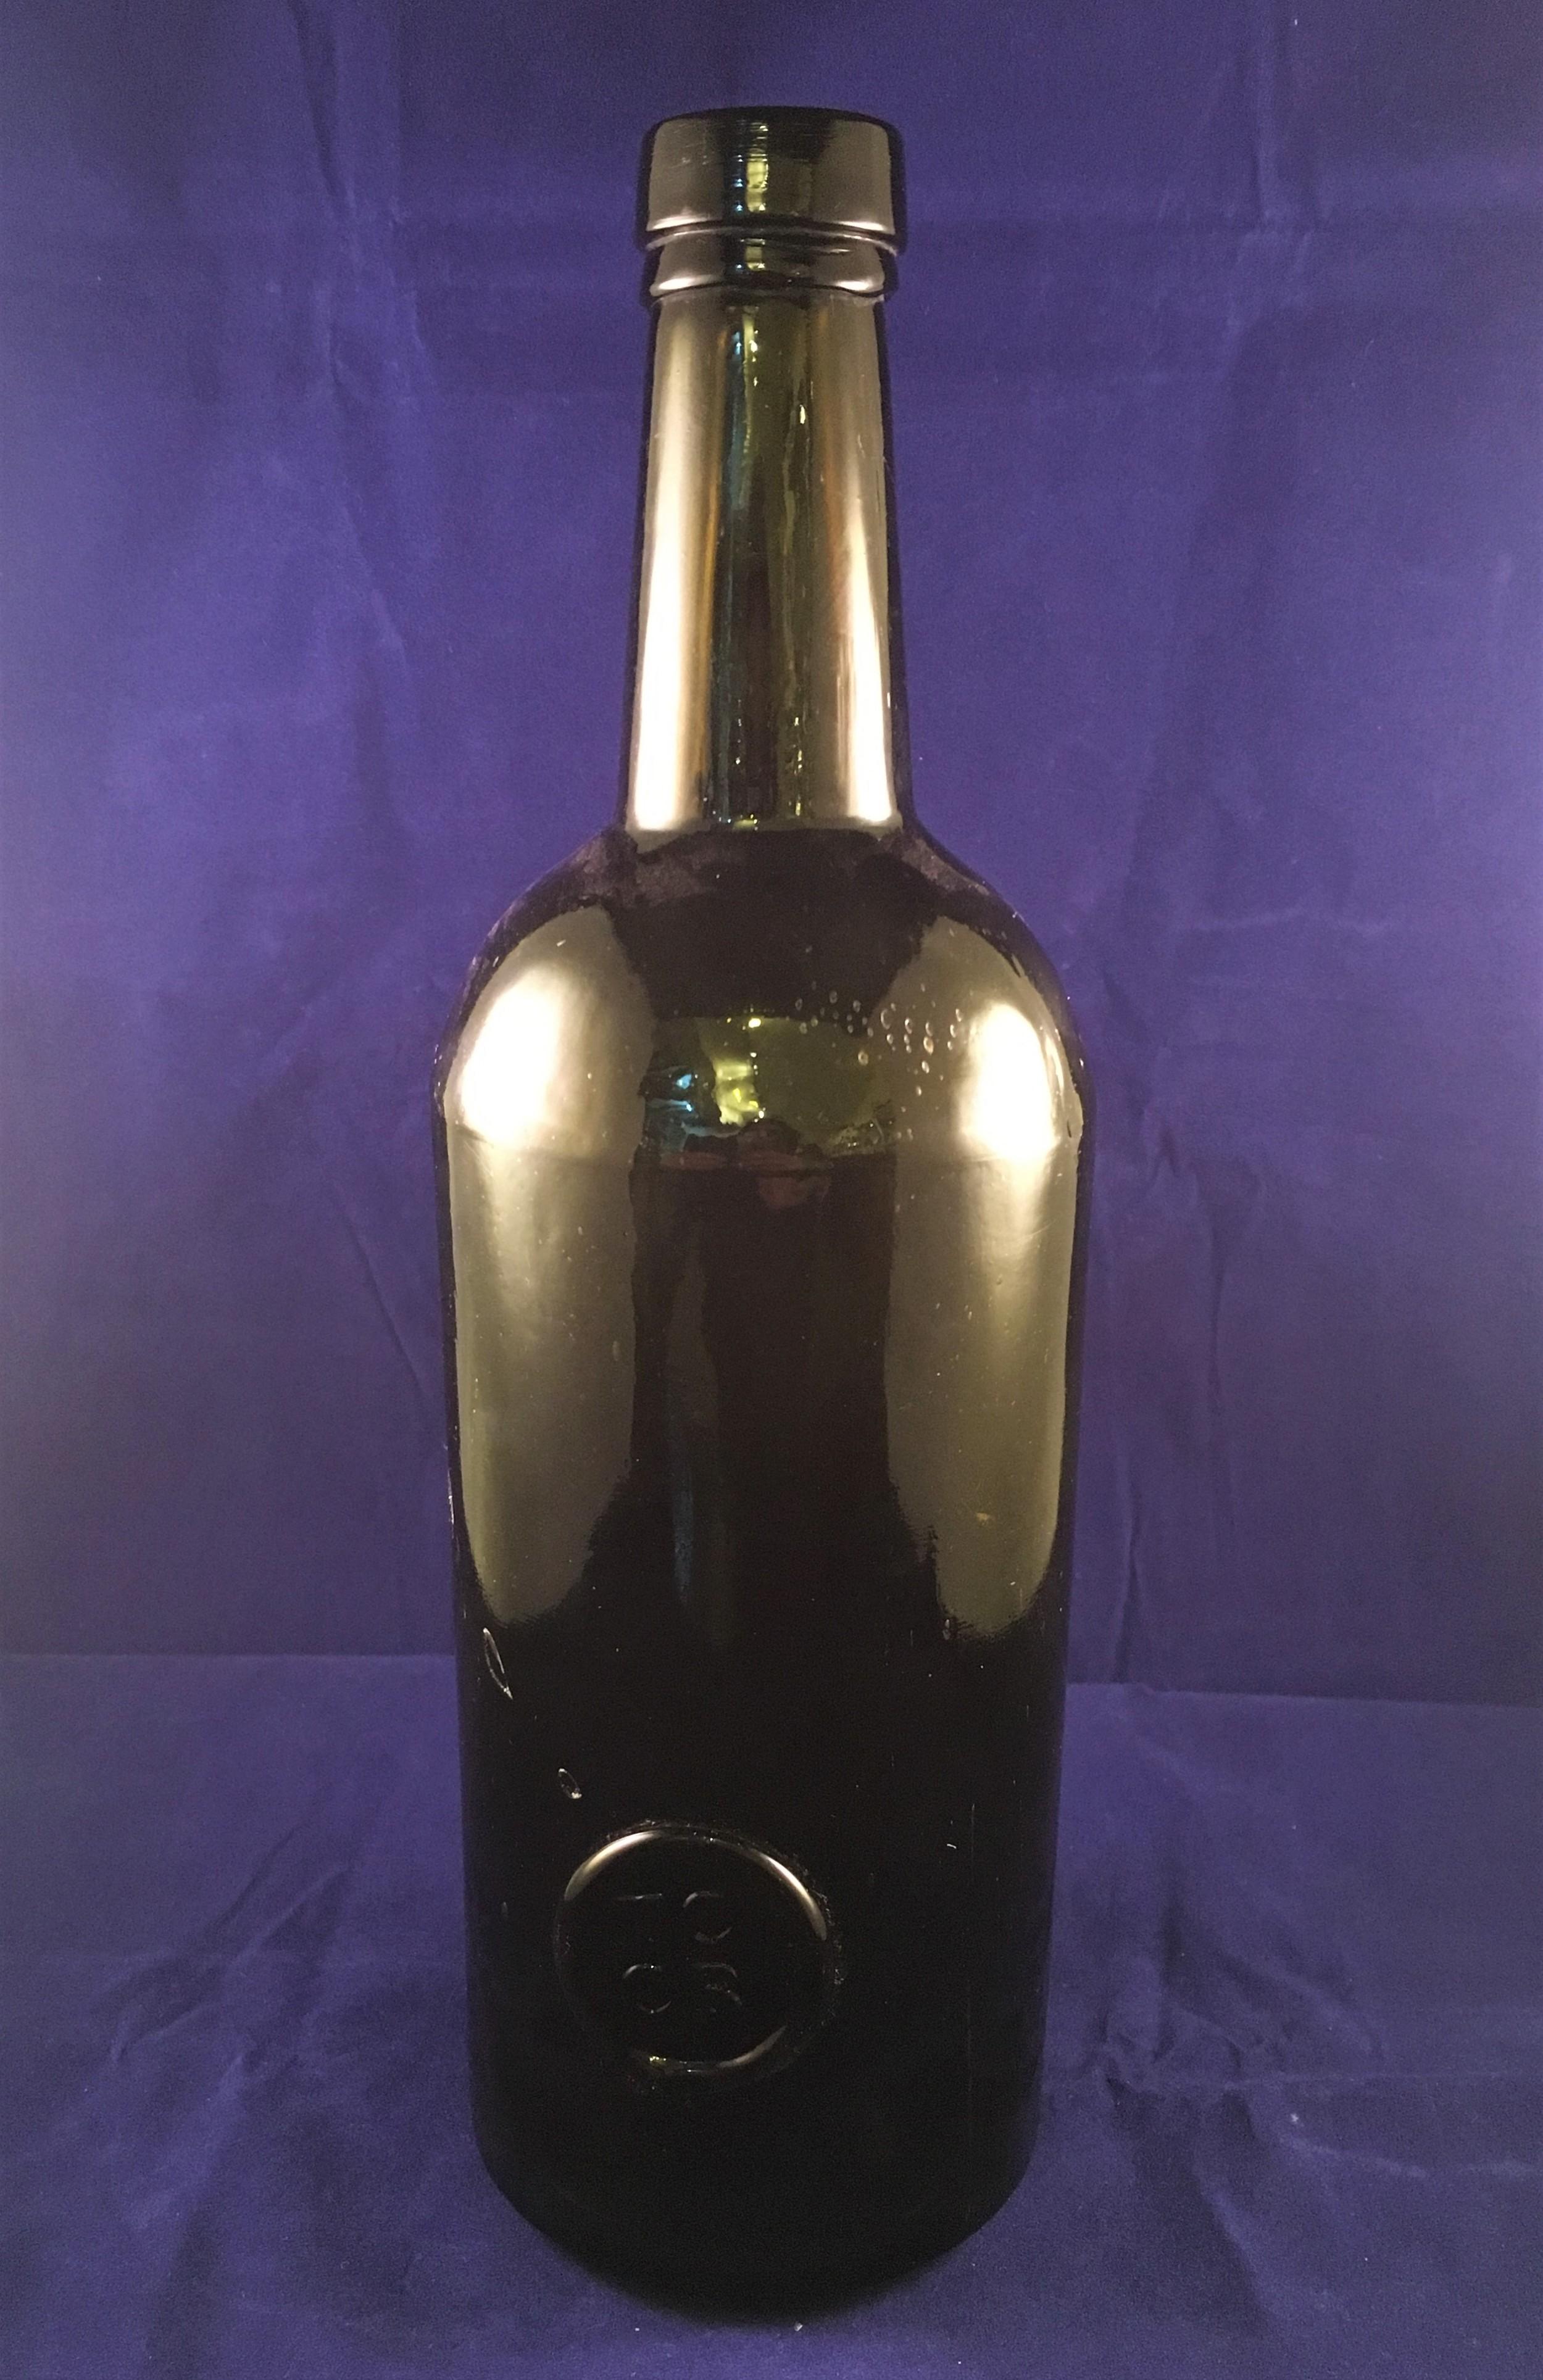 tccr sealed bottle dark green colour c19th